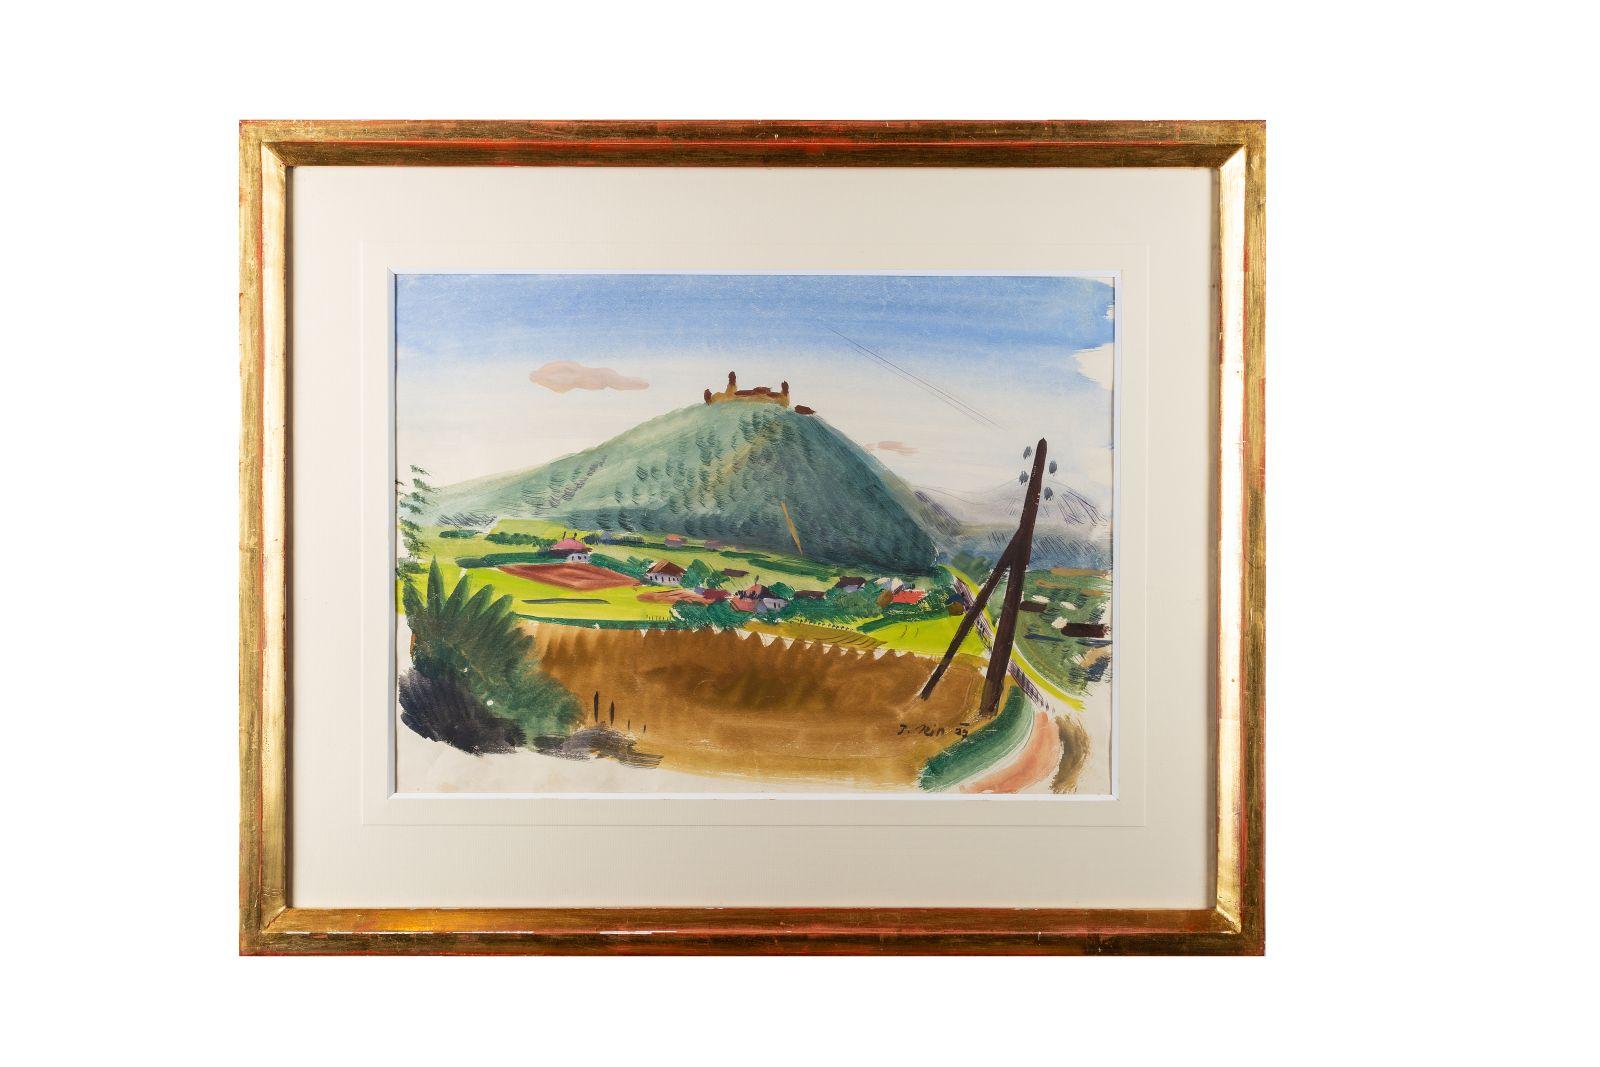 "#82 J. Rim, ""View of Göttweig"" | J. Rim, ""Blick auf Göttweig"" Image"